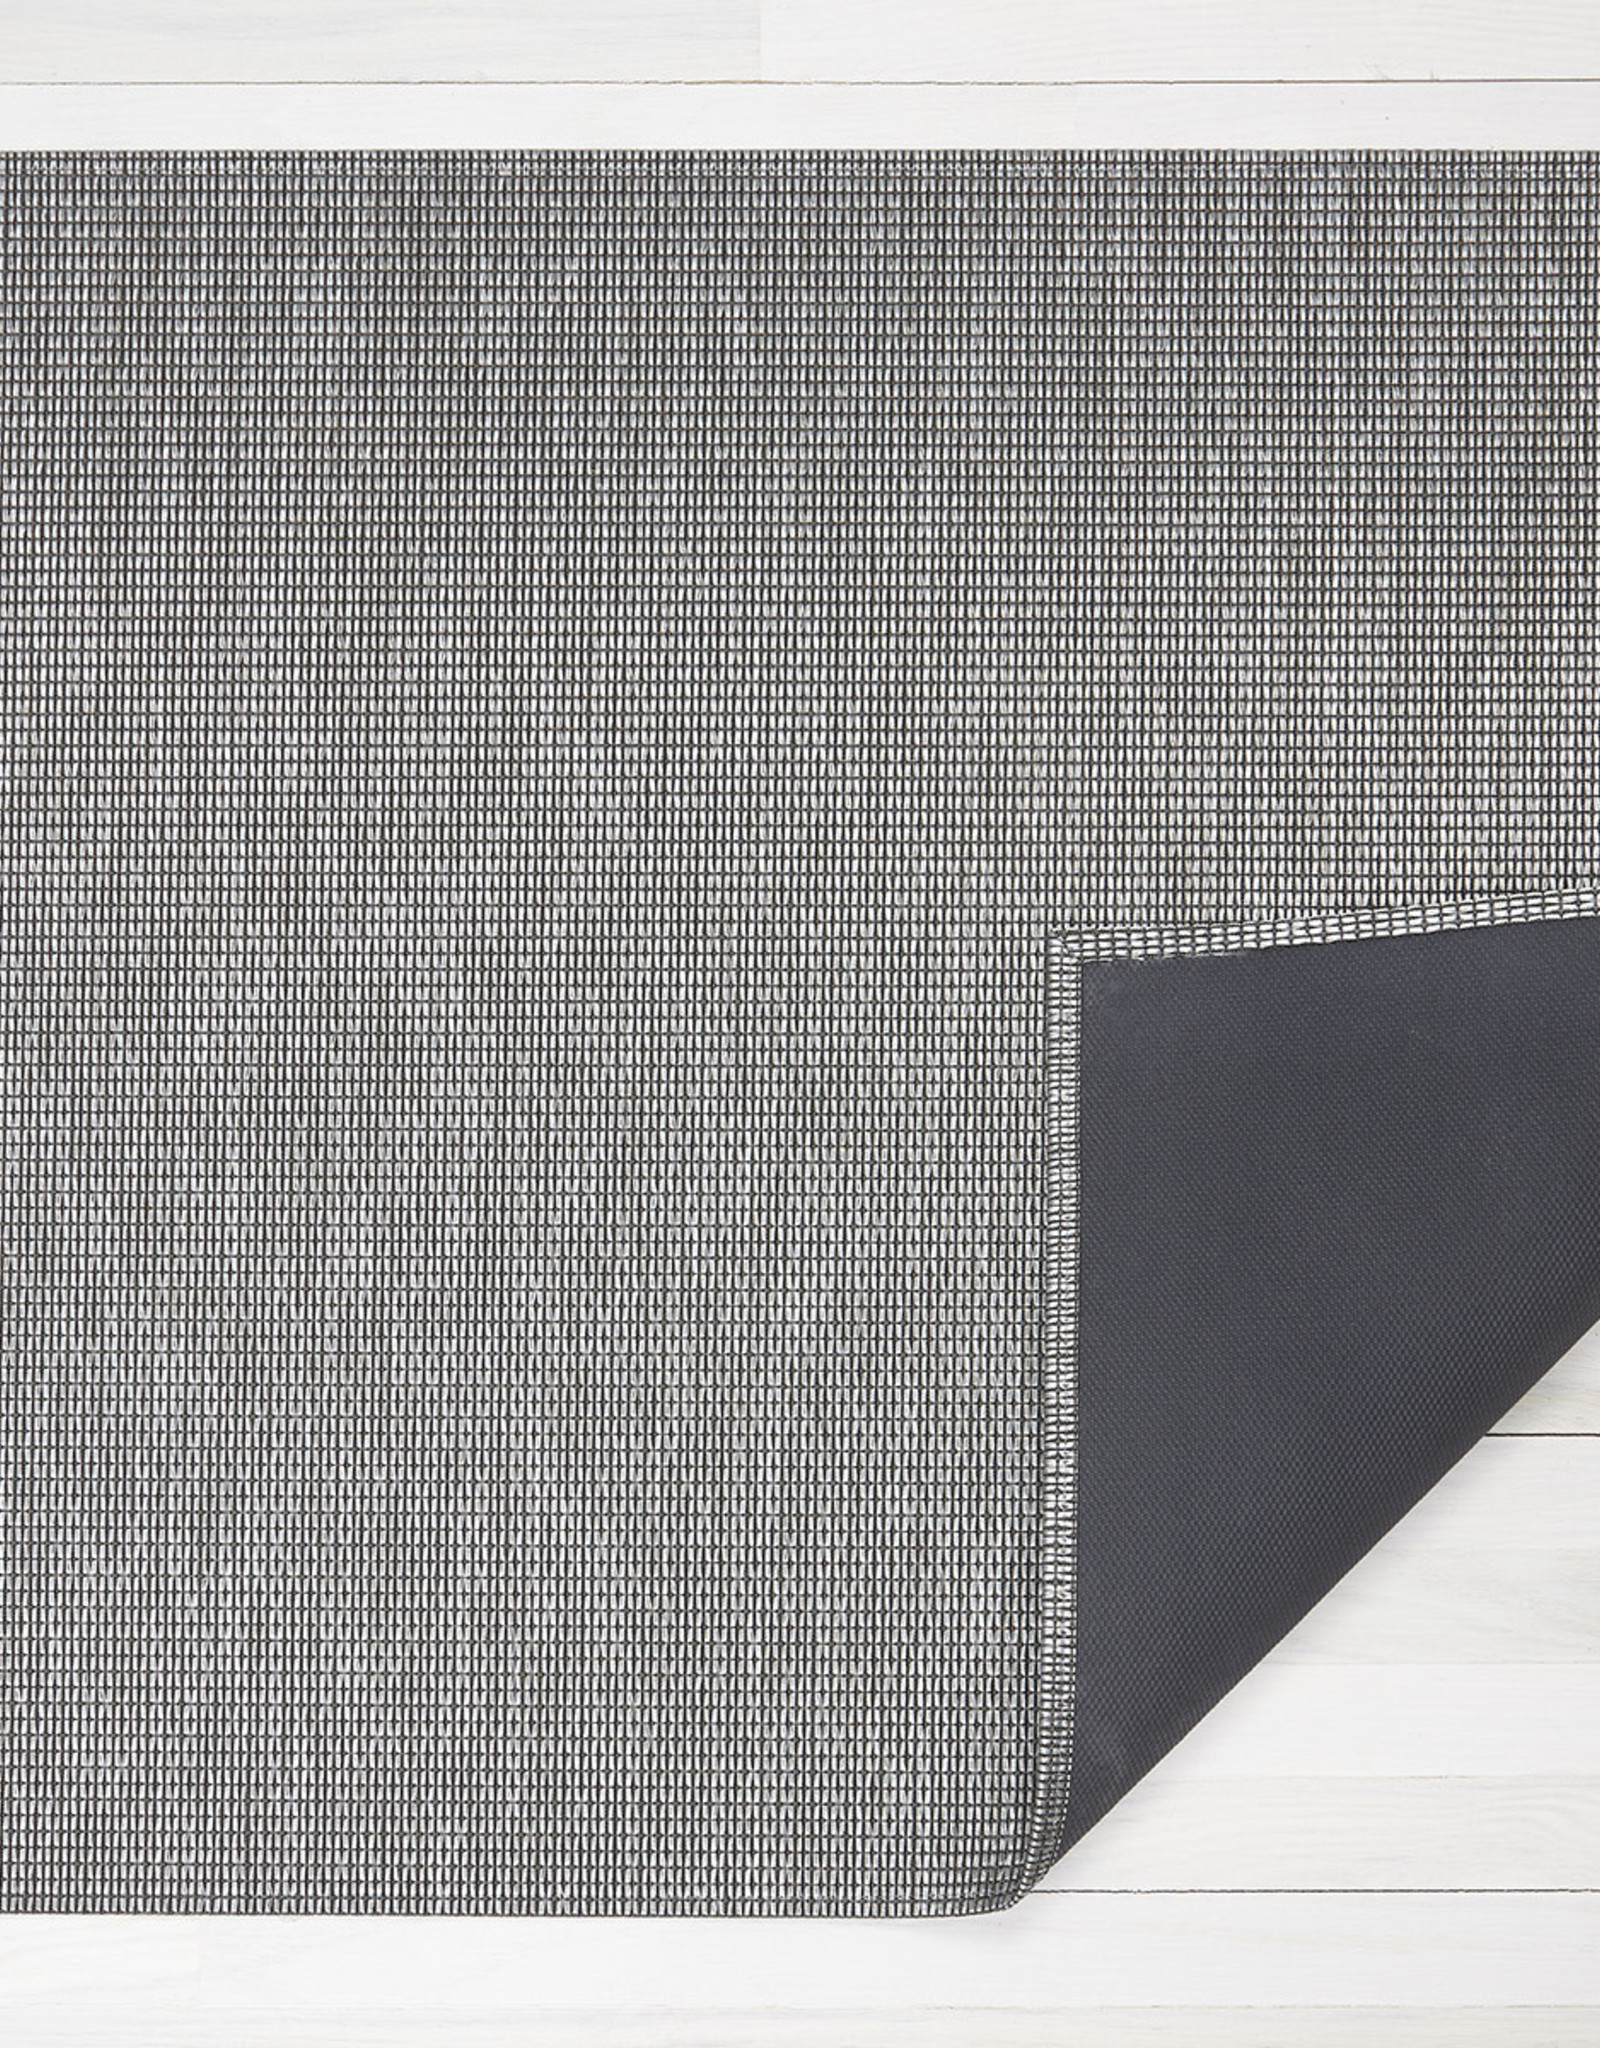 Chilewich Wabi Sabi Floormat 26 x 72, MICA